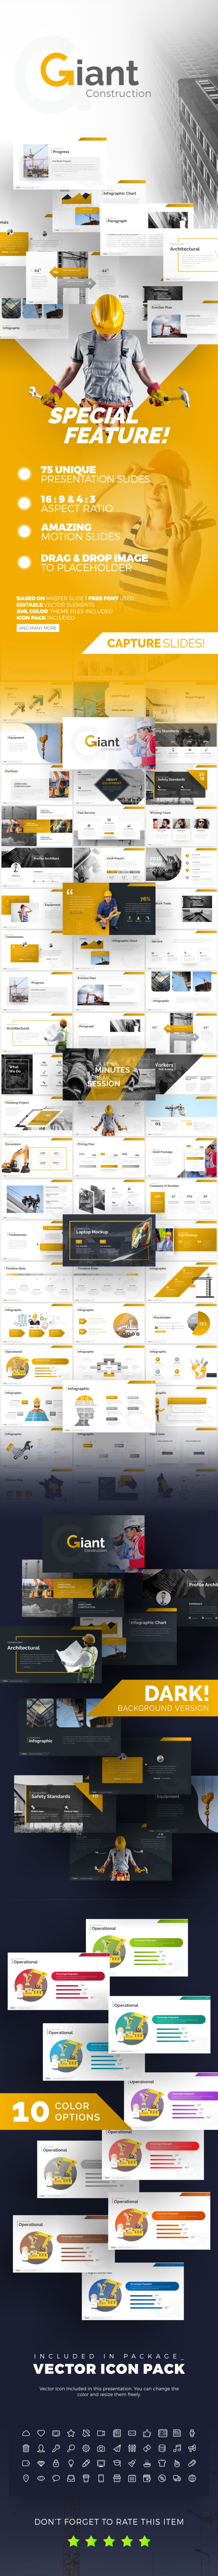 Giant Construction PowerPoint Presentation Template - PowerPoint Templates Presentation Templates